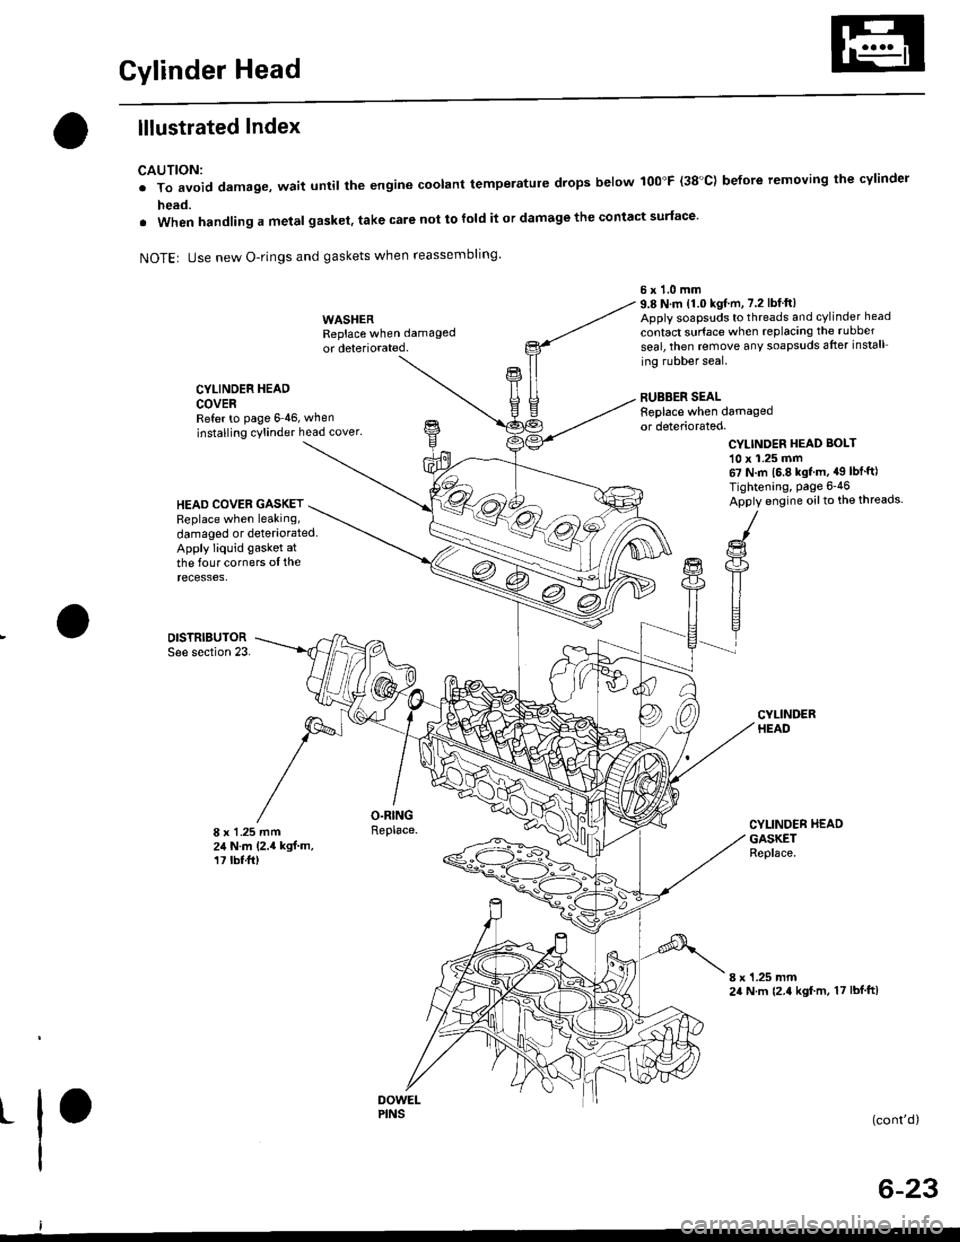 medium resolution of g workshop manual page 134